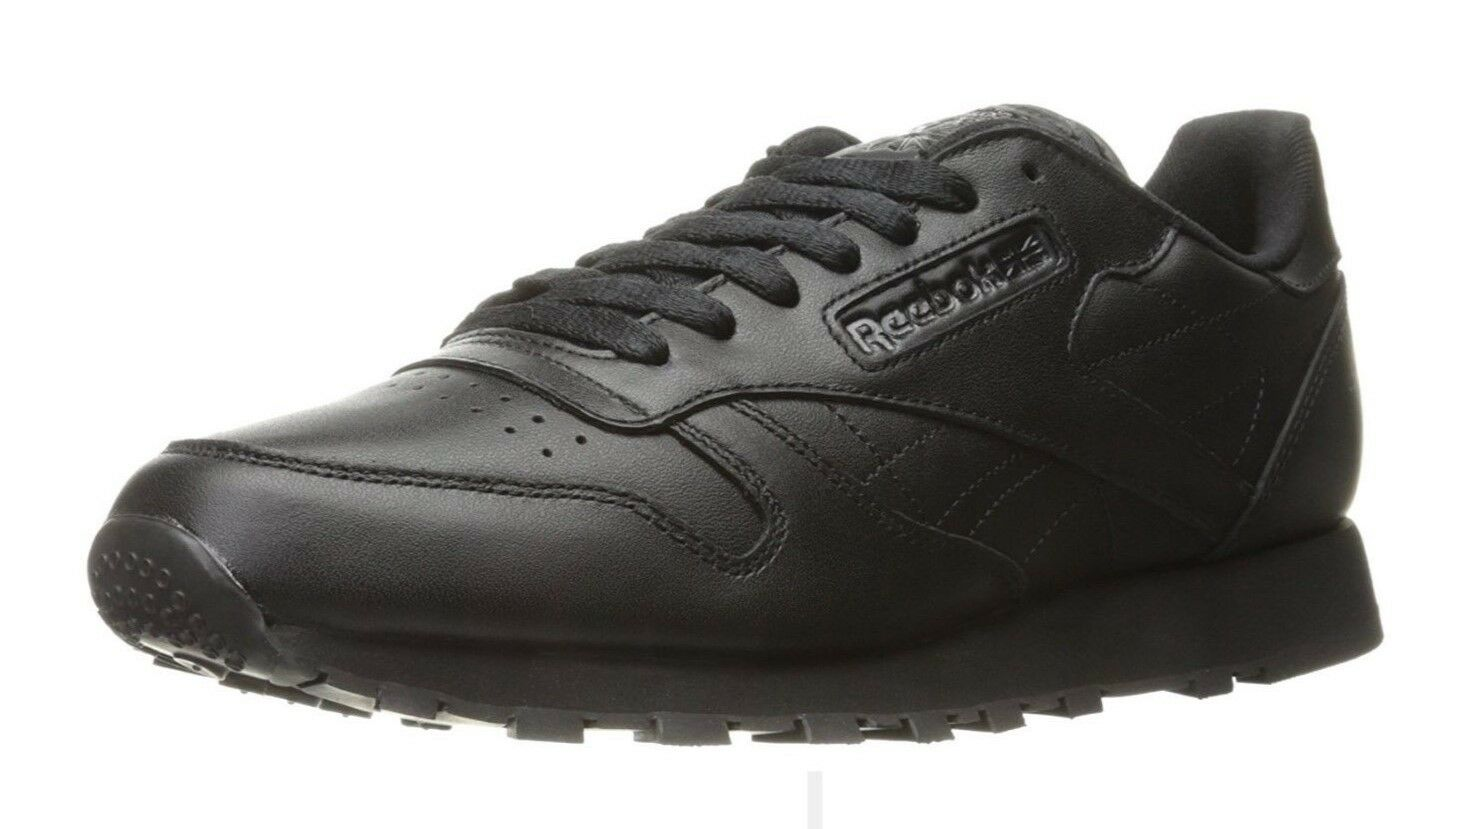 REEBOKMen's Classic CL LTHR Black/Black Sneaker, Size 14, Soft Leather J90119